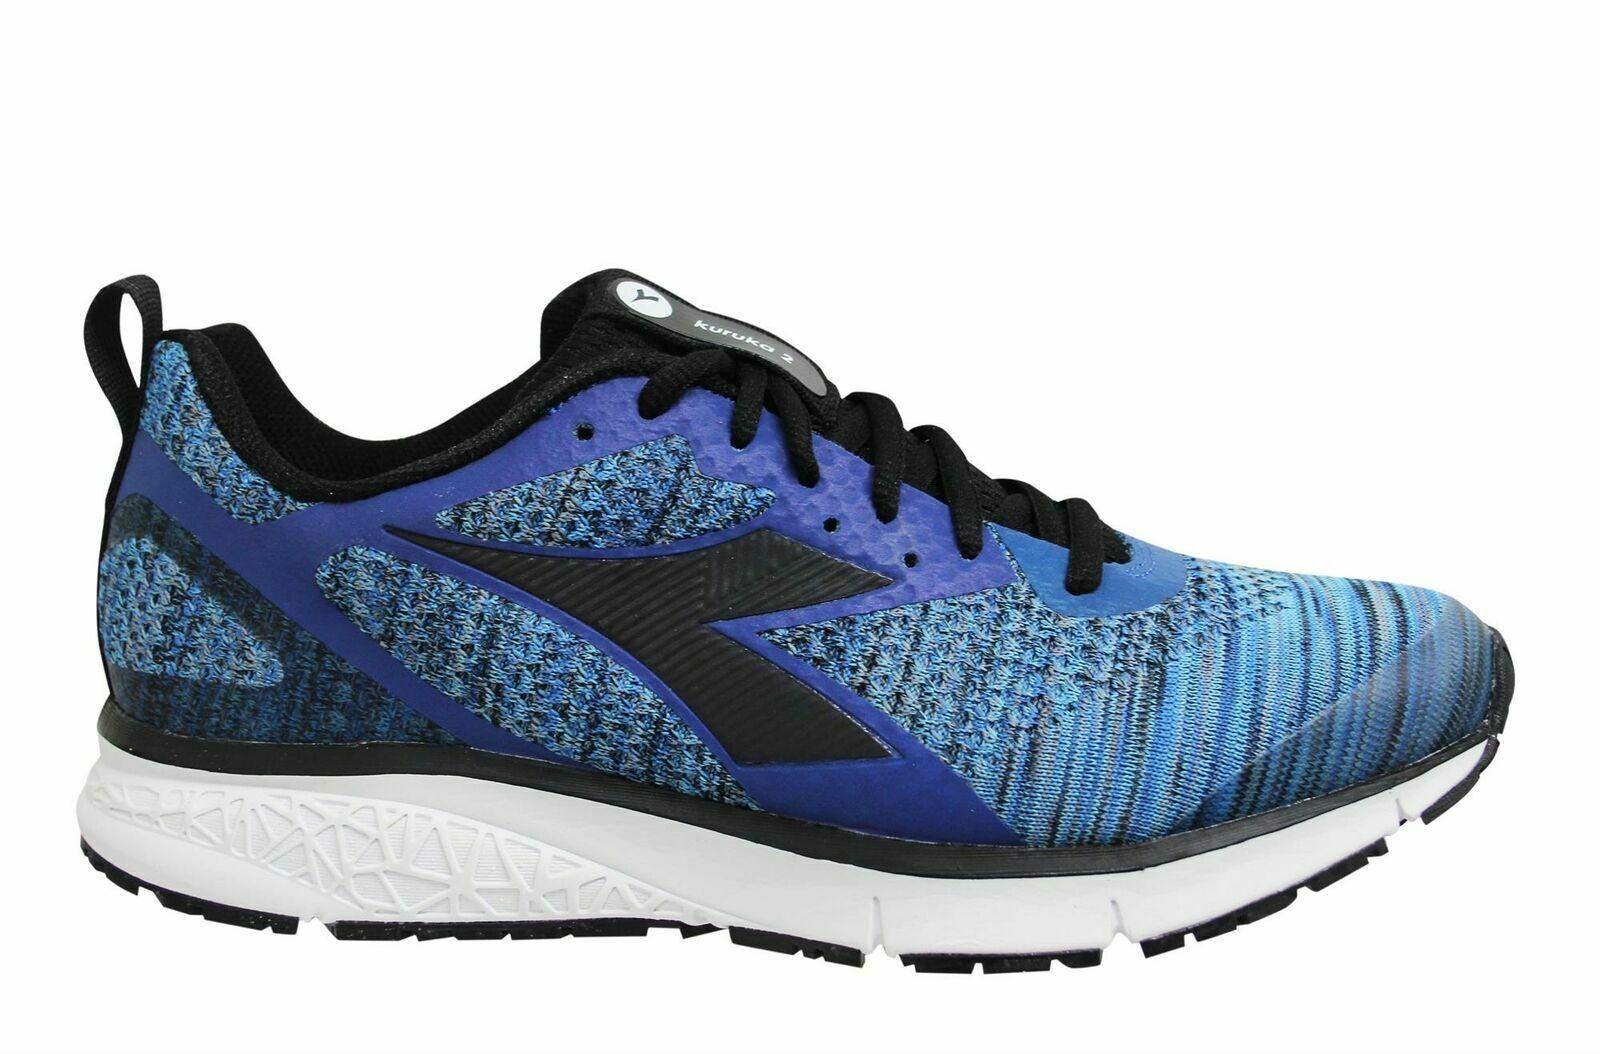 Diadora Kuruka 2 Moonlight Blue Black Low Lace Up Mens Running Trainers C5545